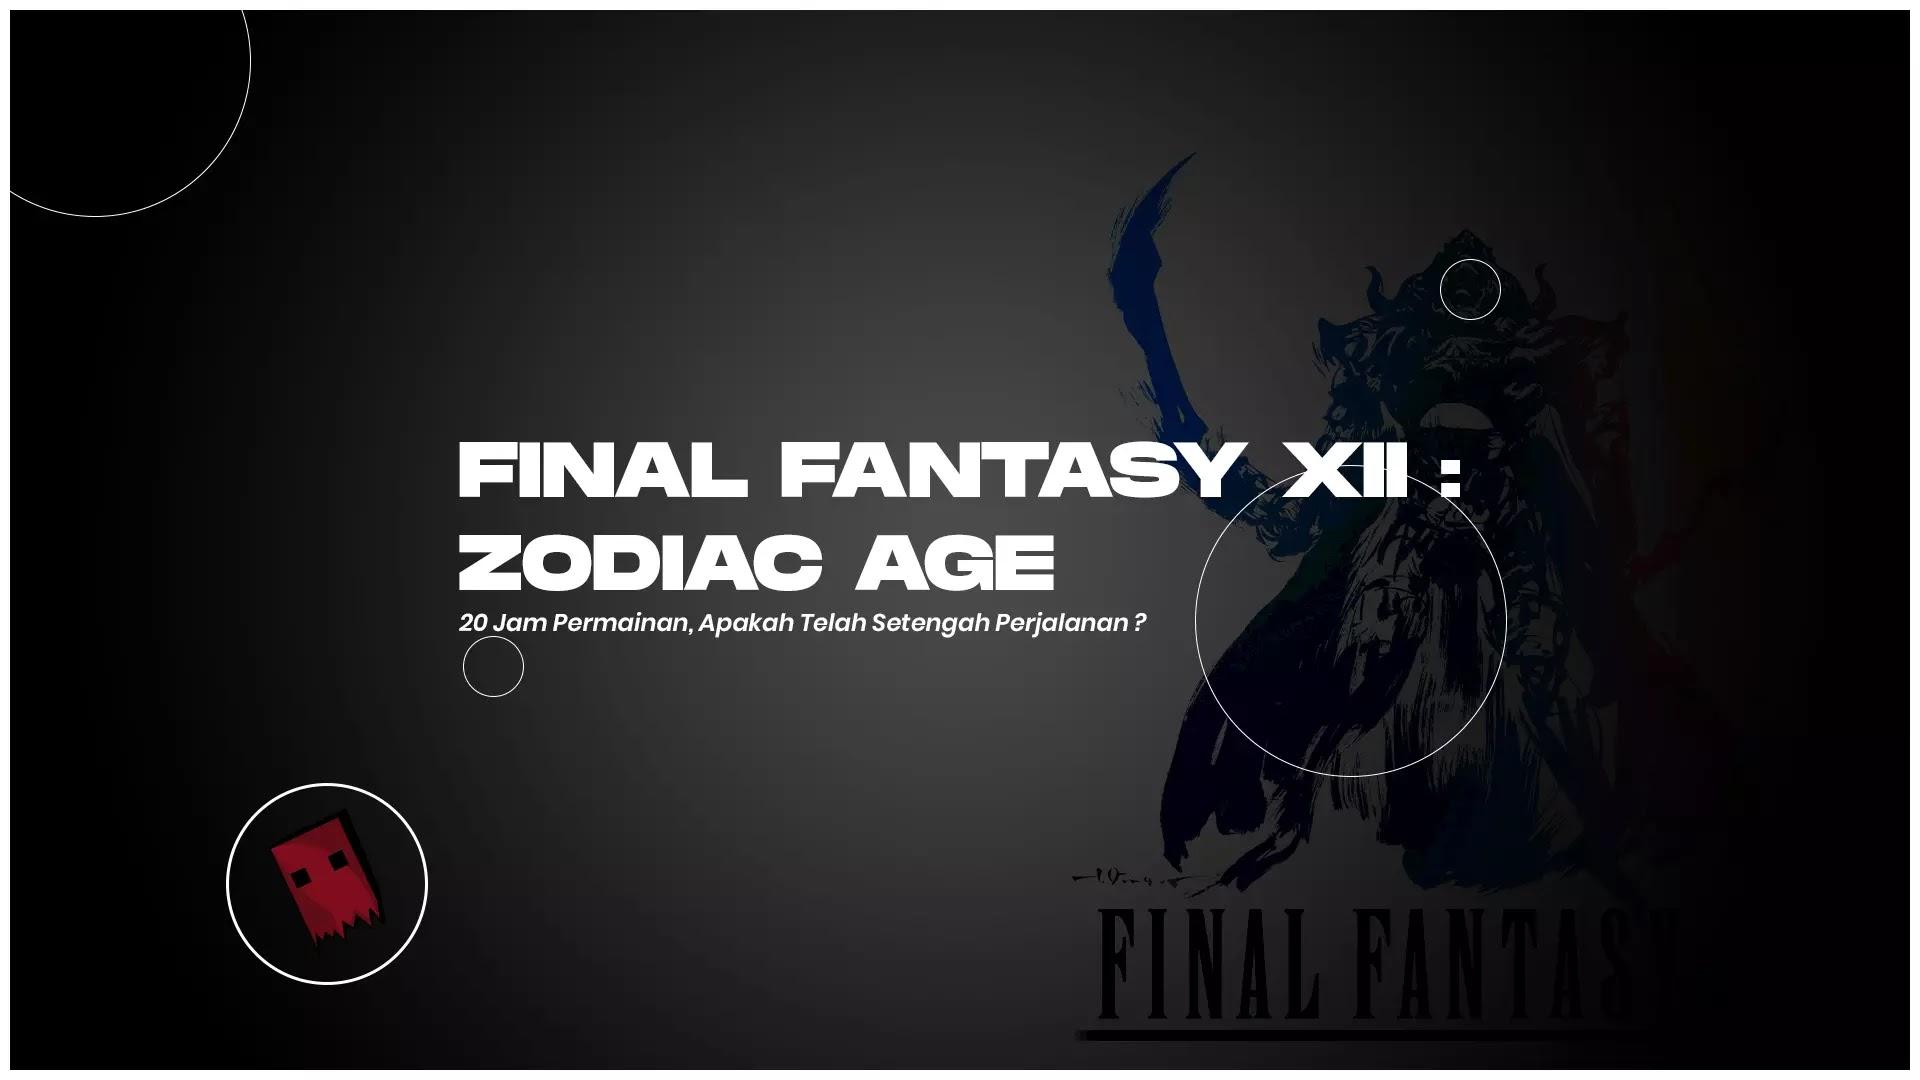 Final Fantasy XII : Zodiac Age -  20 Jam Permainan, Apakah Telah Setengah Perjalanan ?